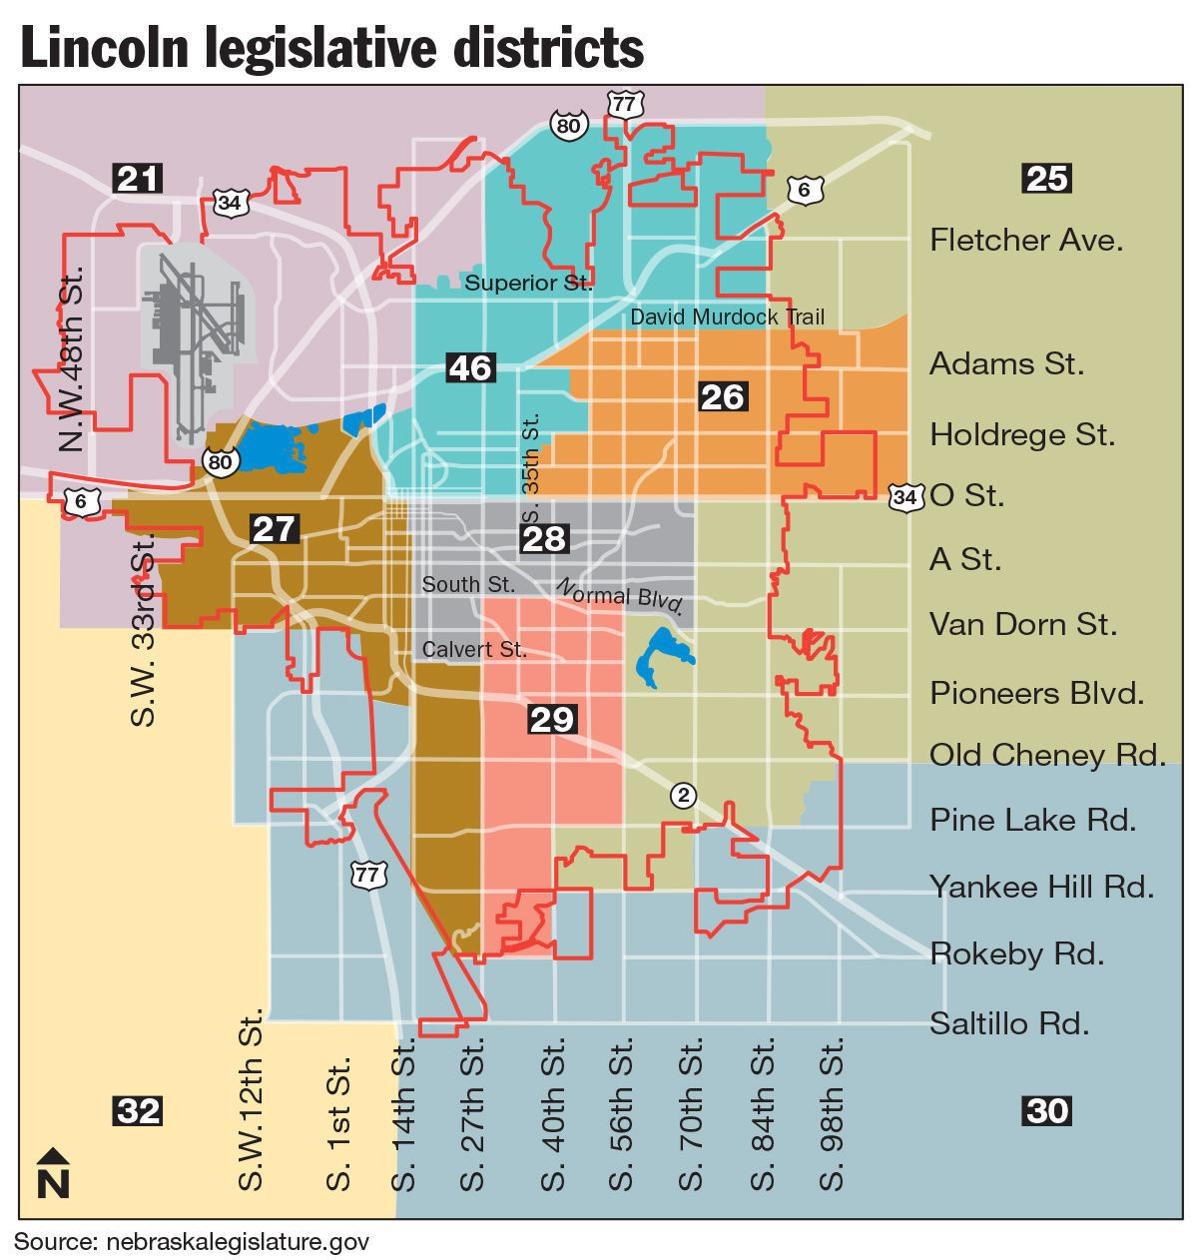 Legislative district map